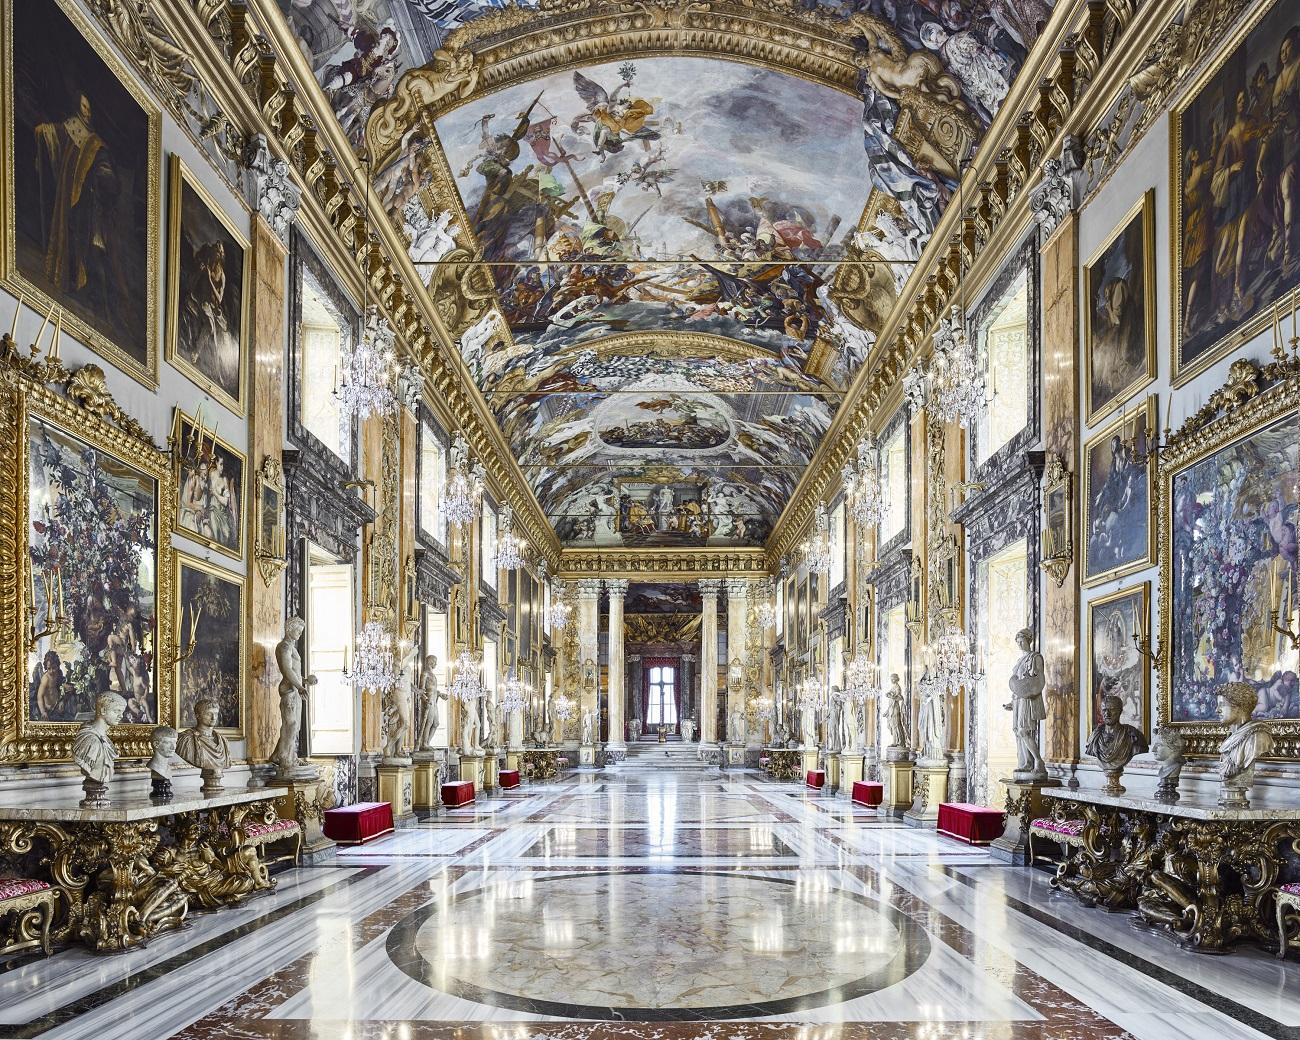 Galleria, Palazzo Colonna, Rome https://flowartstation.com/